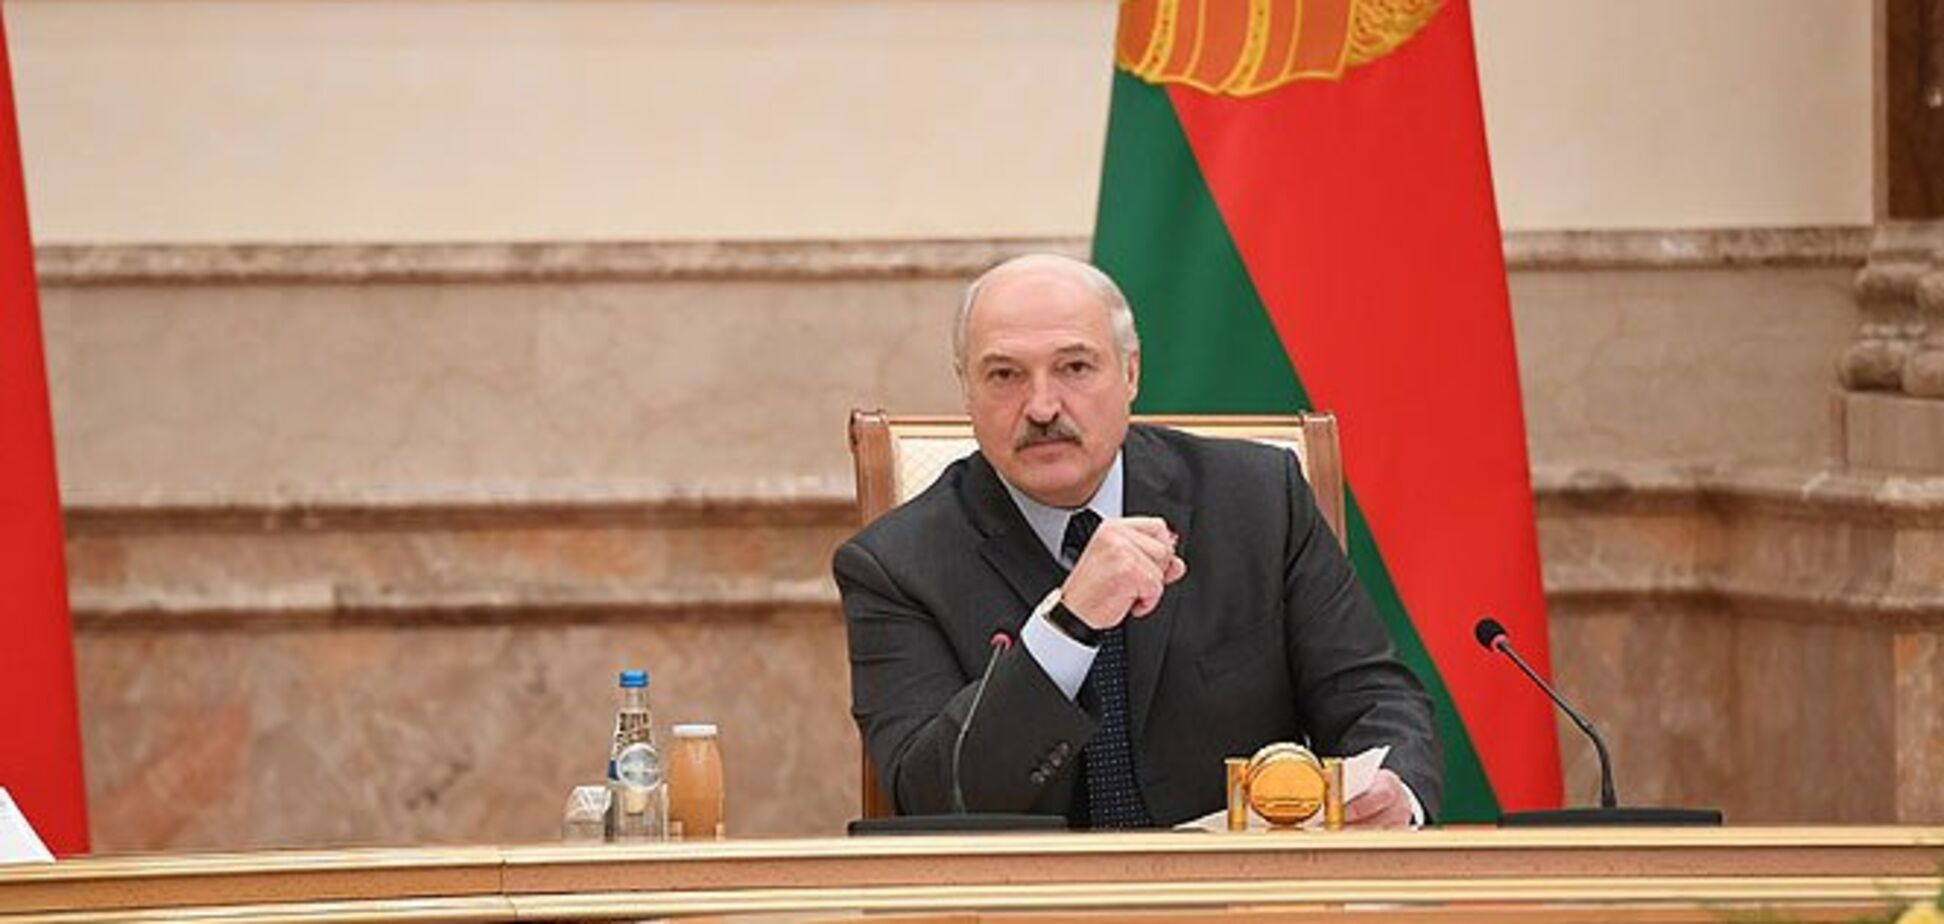 ''Конфлікт на нашій землі'': Лукашенко вписався за ''вибори'' на Донбасі